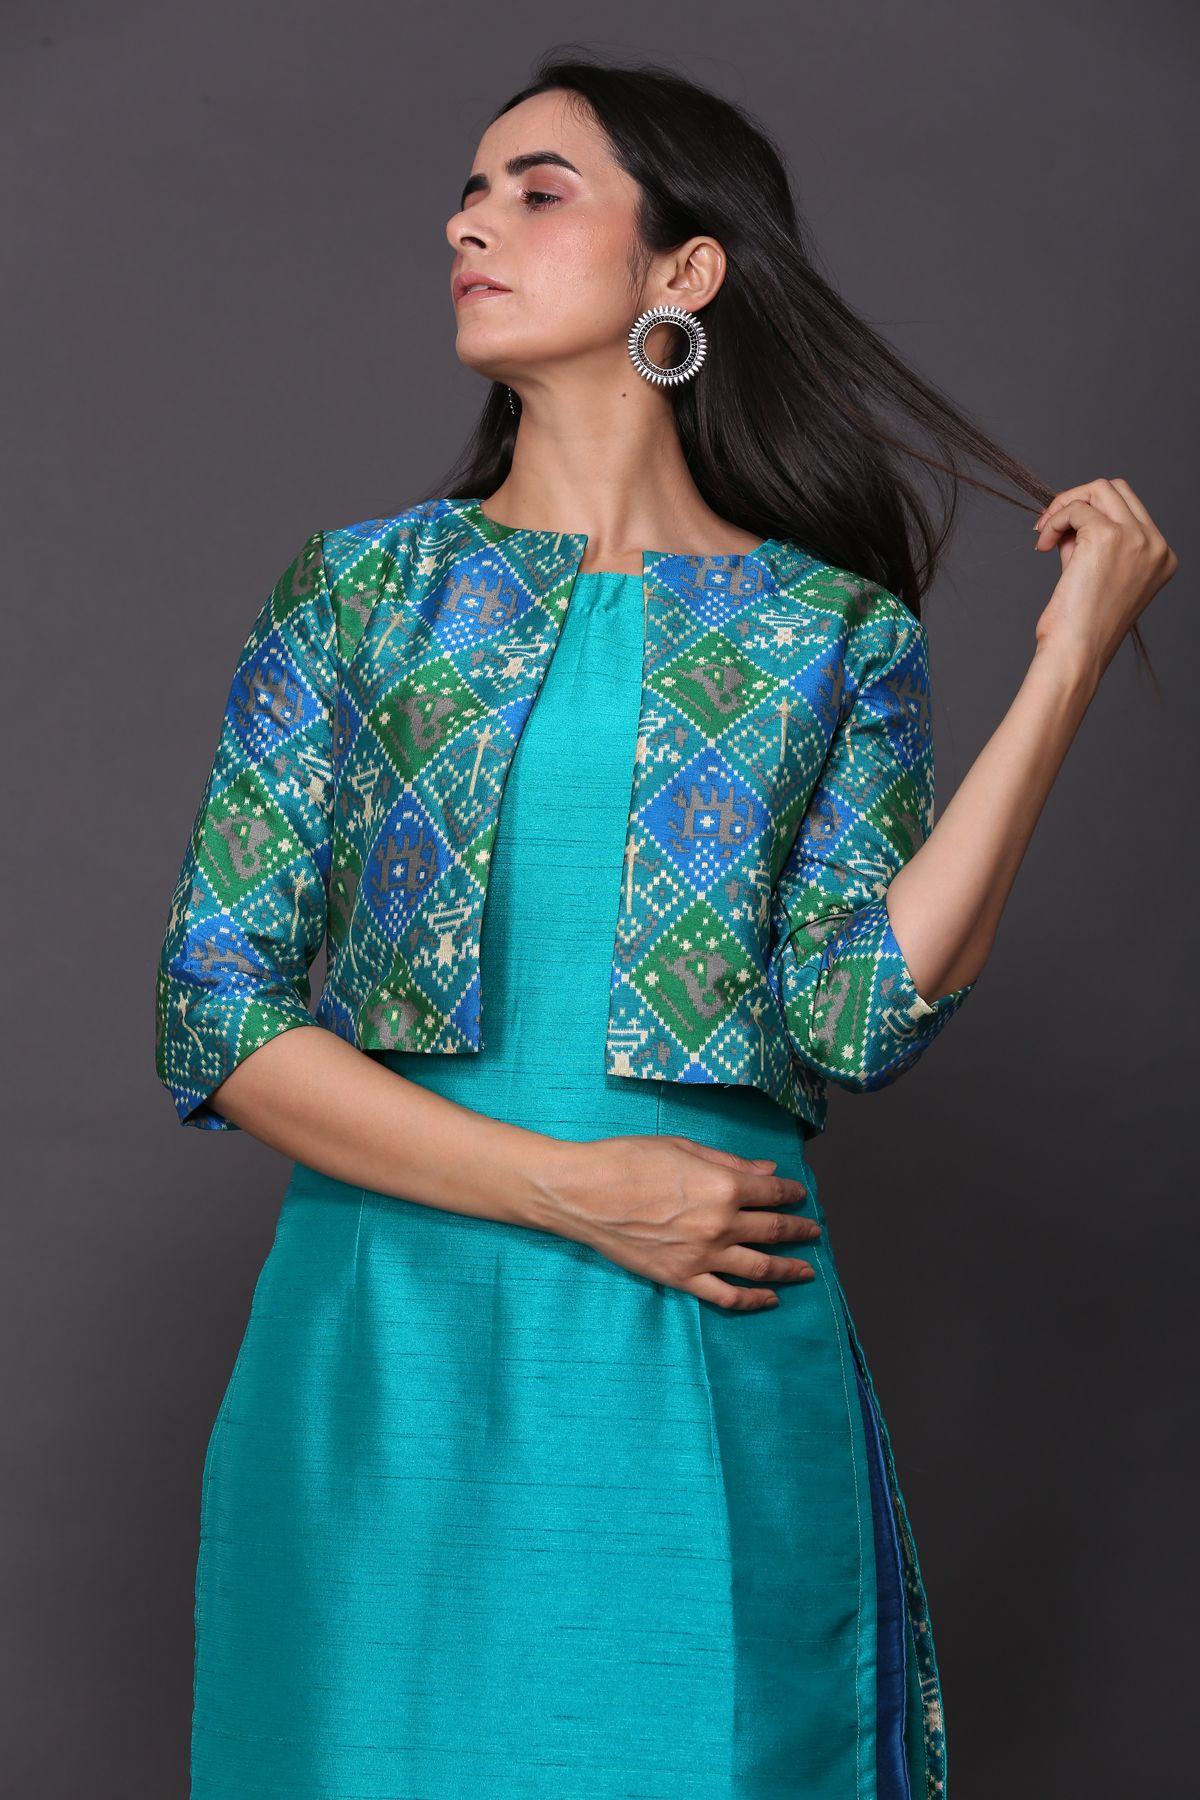 Green Details about  /Women/'s Ethnic Office Festive Daily Wear Cotton Kurta /& Pant Palazzo Set